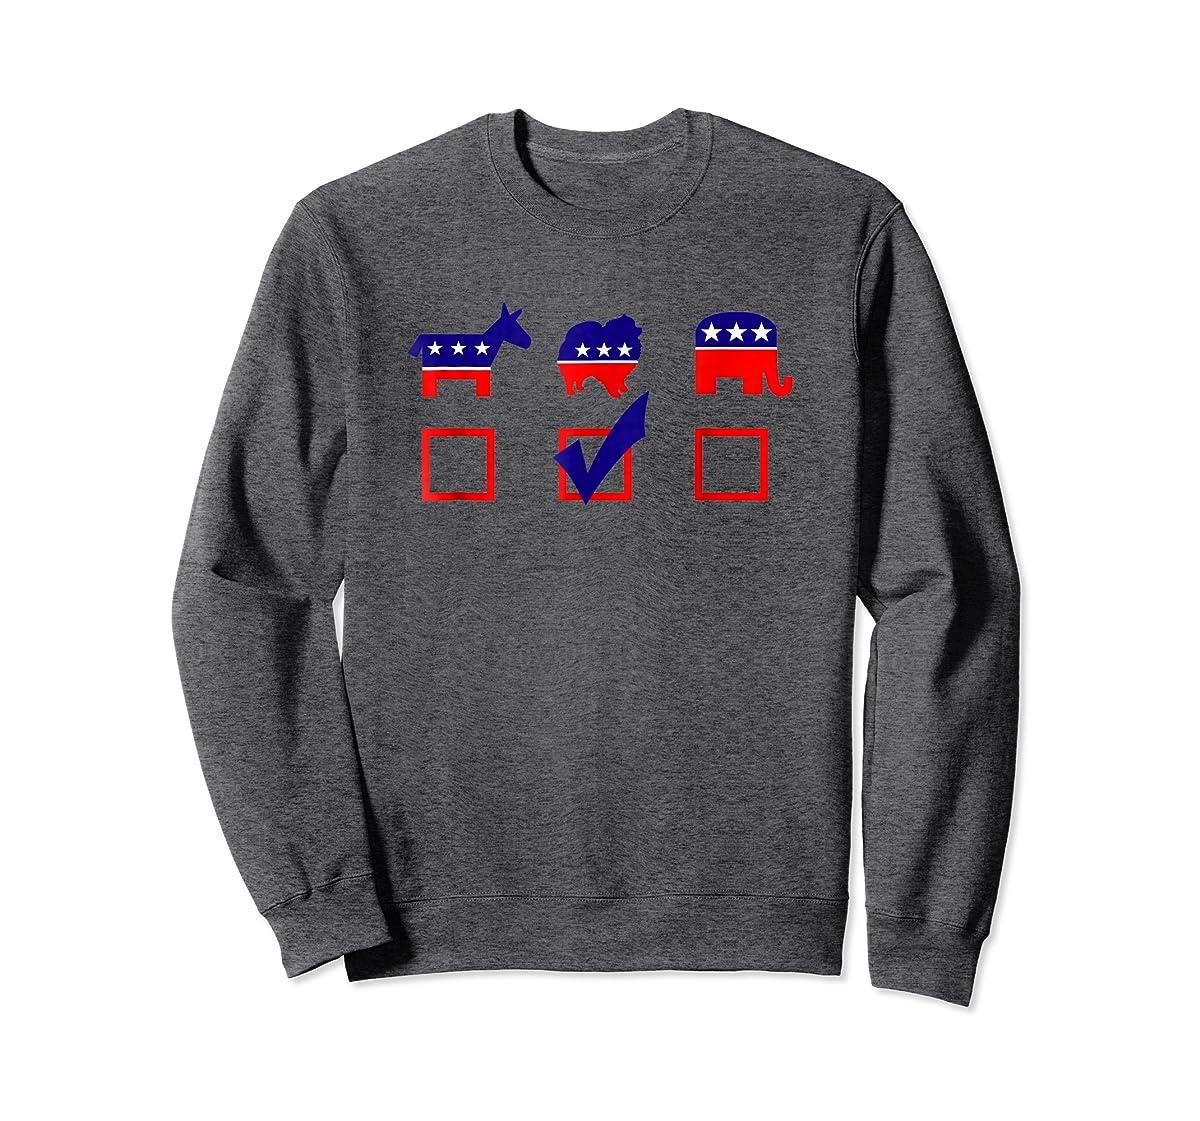 Vote Pomeranian For President T-shirt Cool Dog Lover Shirt-Sweatshirt-Dark Heather